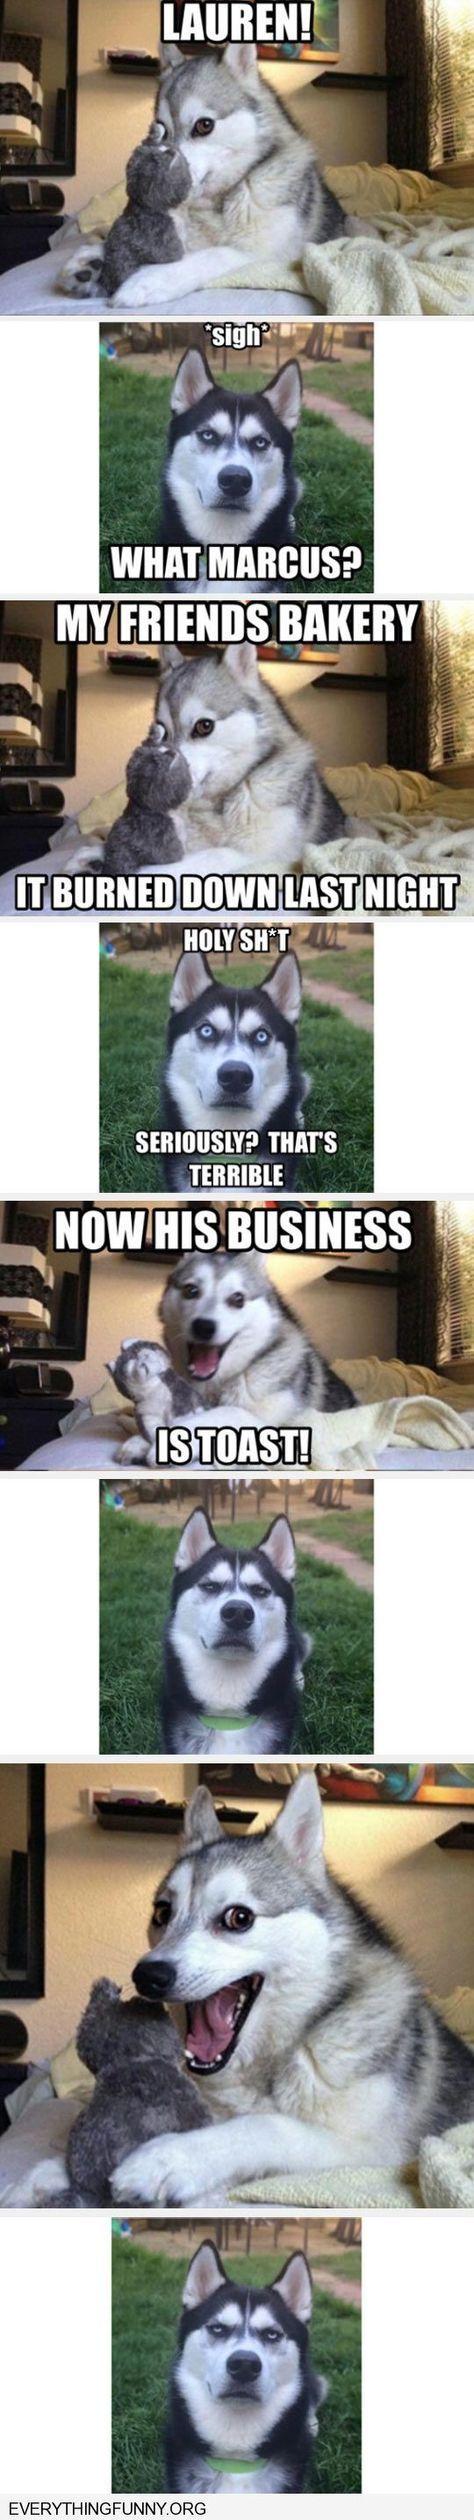 funny dog joke meme with angry husky